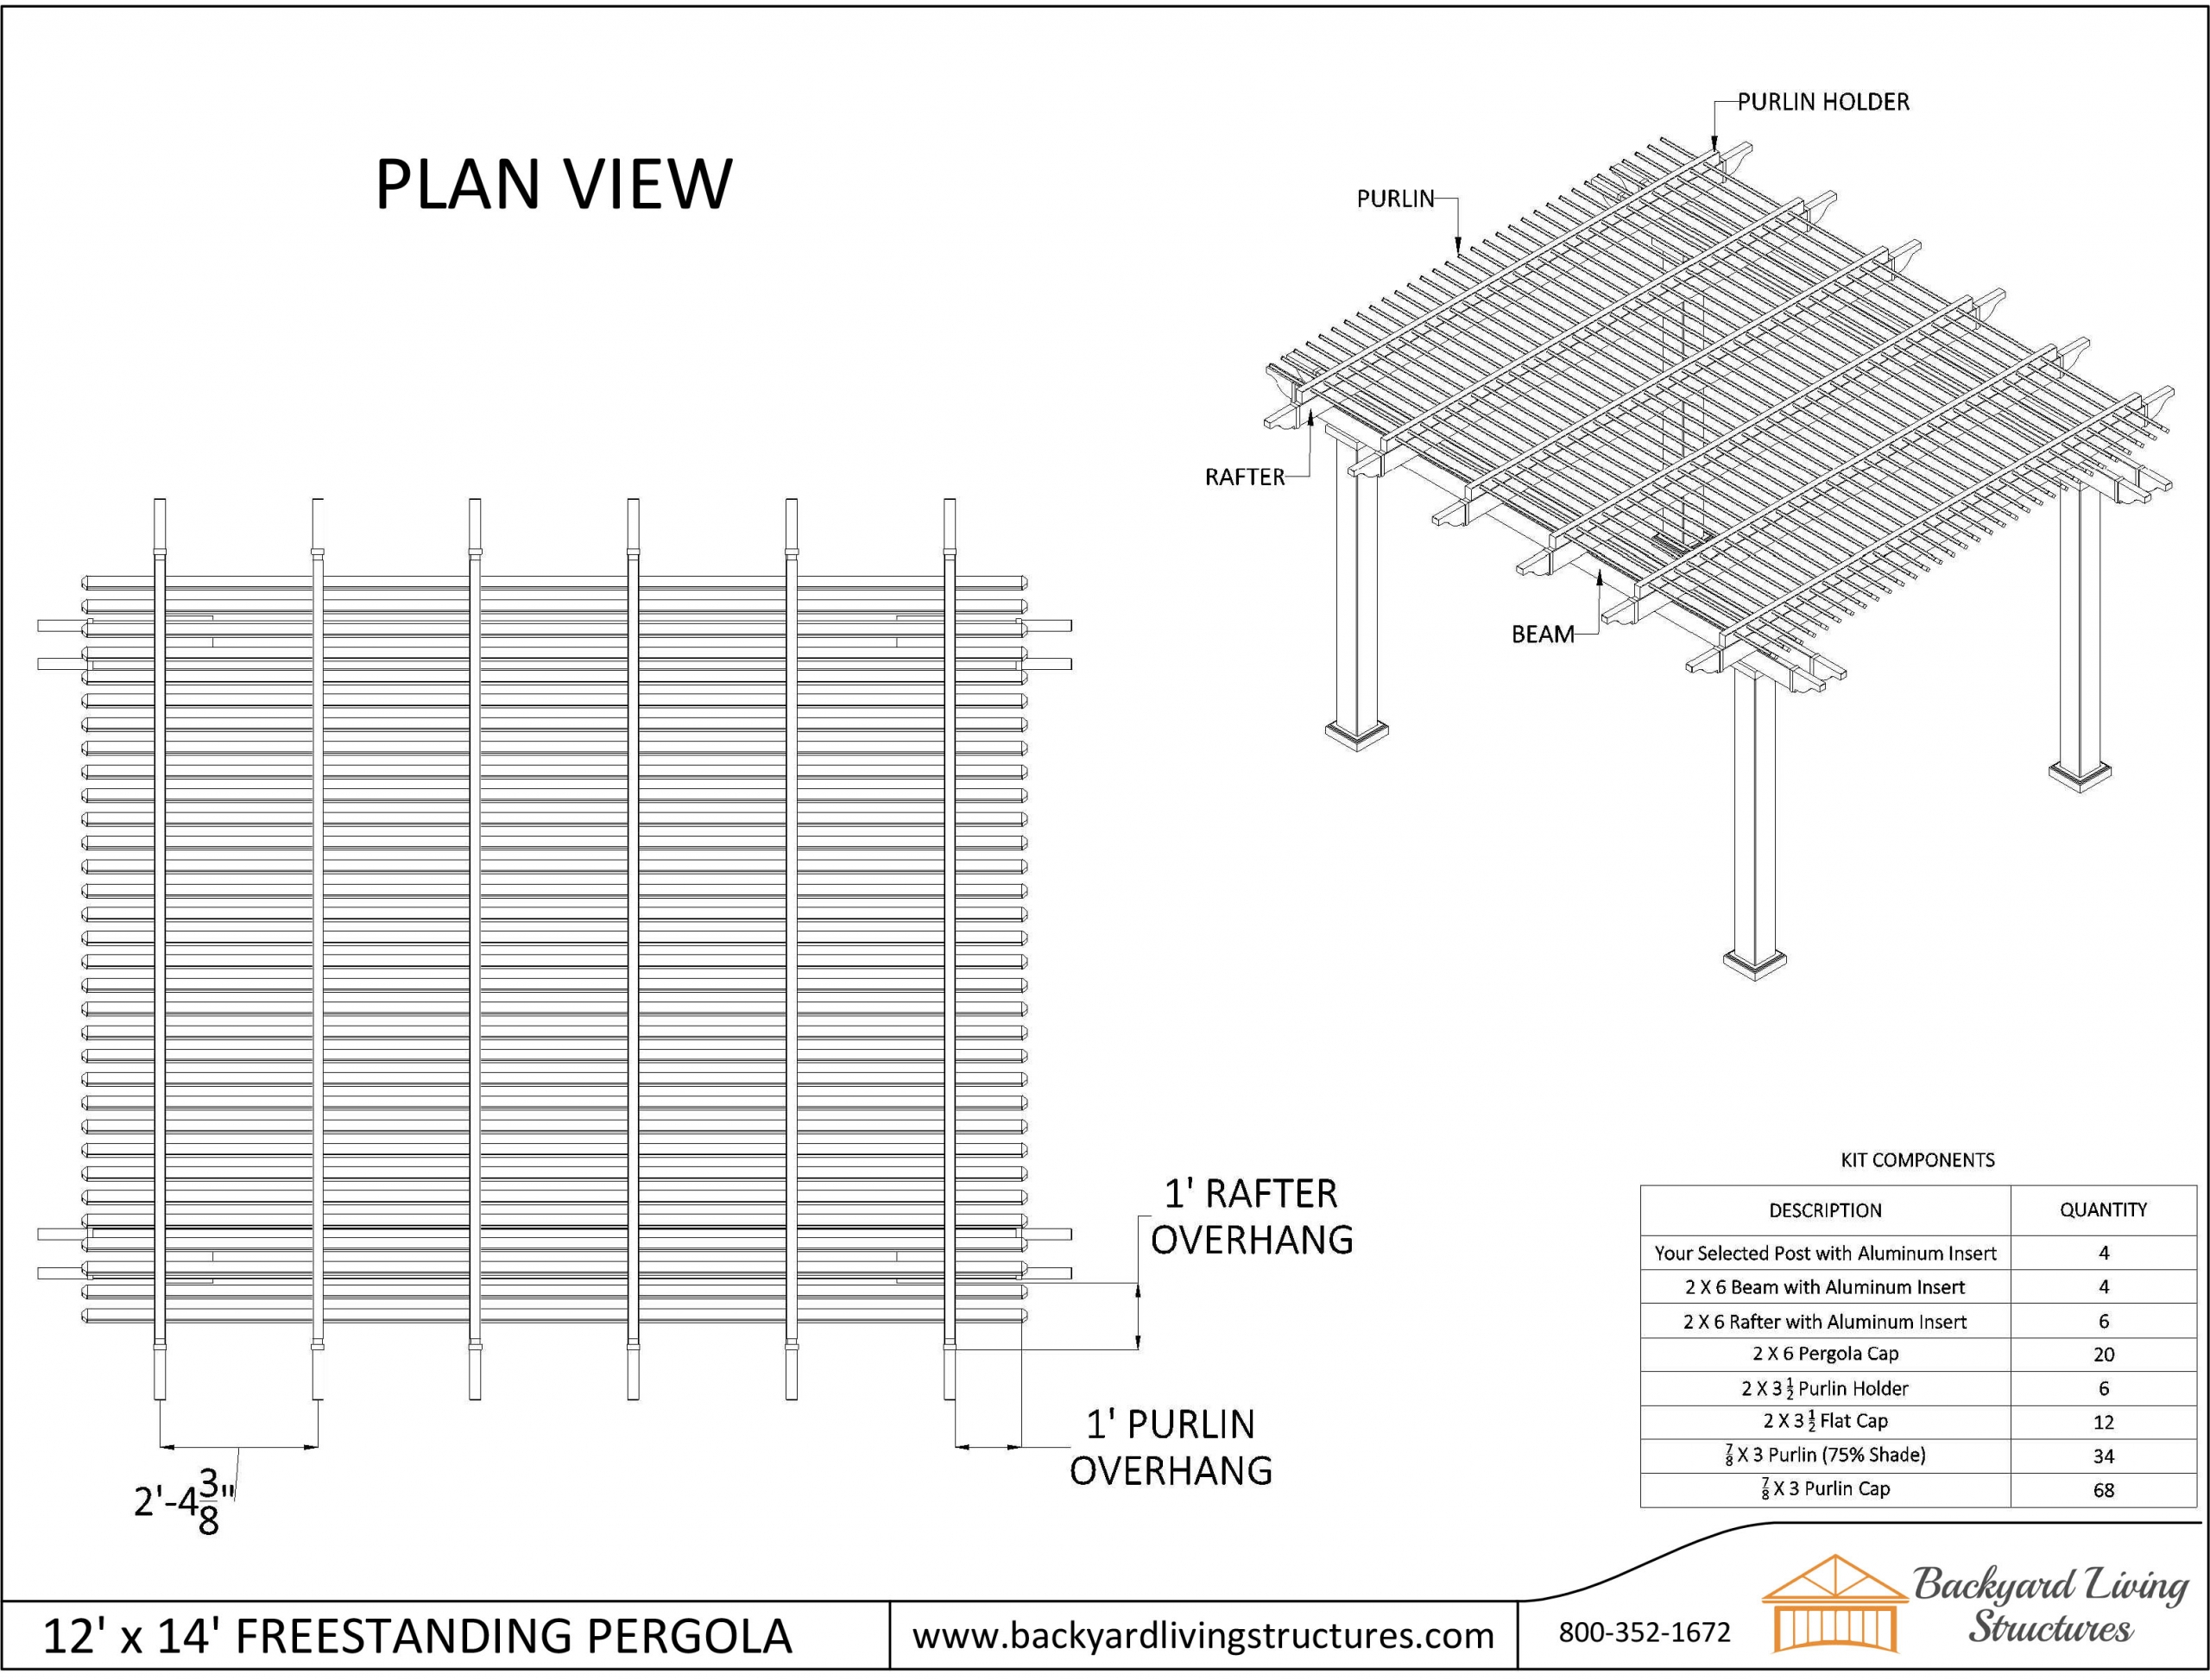 Freestanding pergola plan view